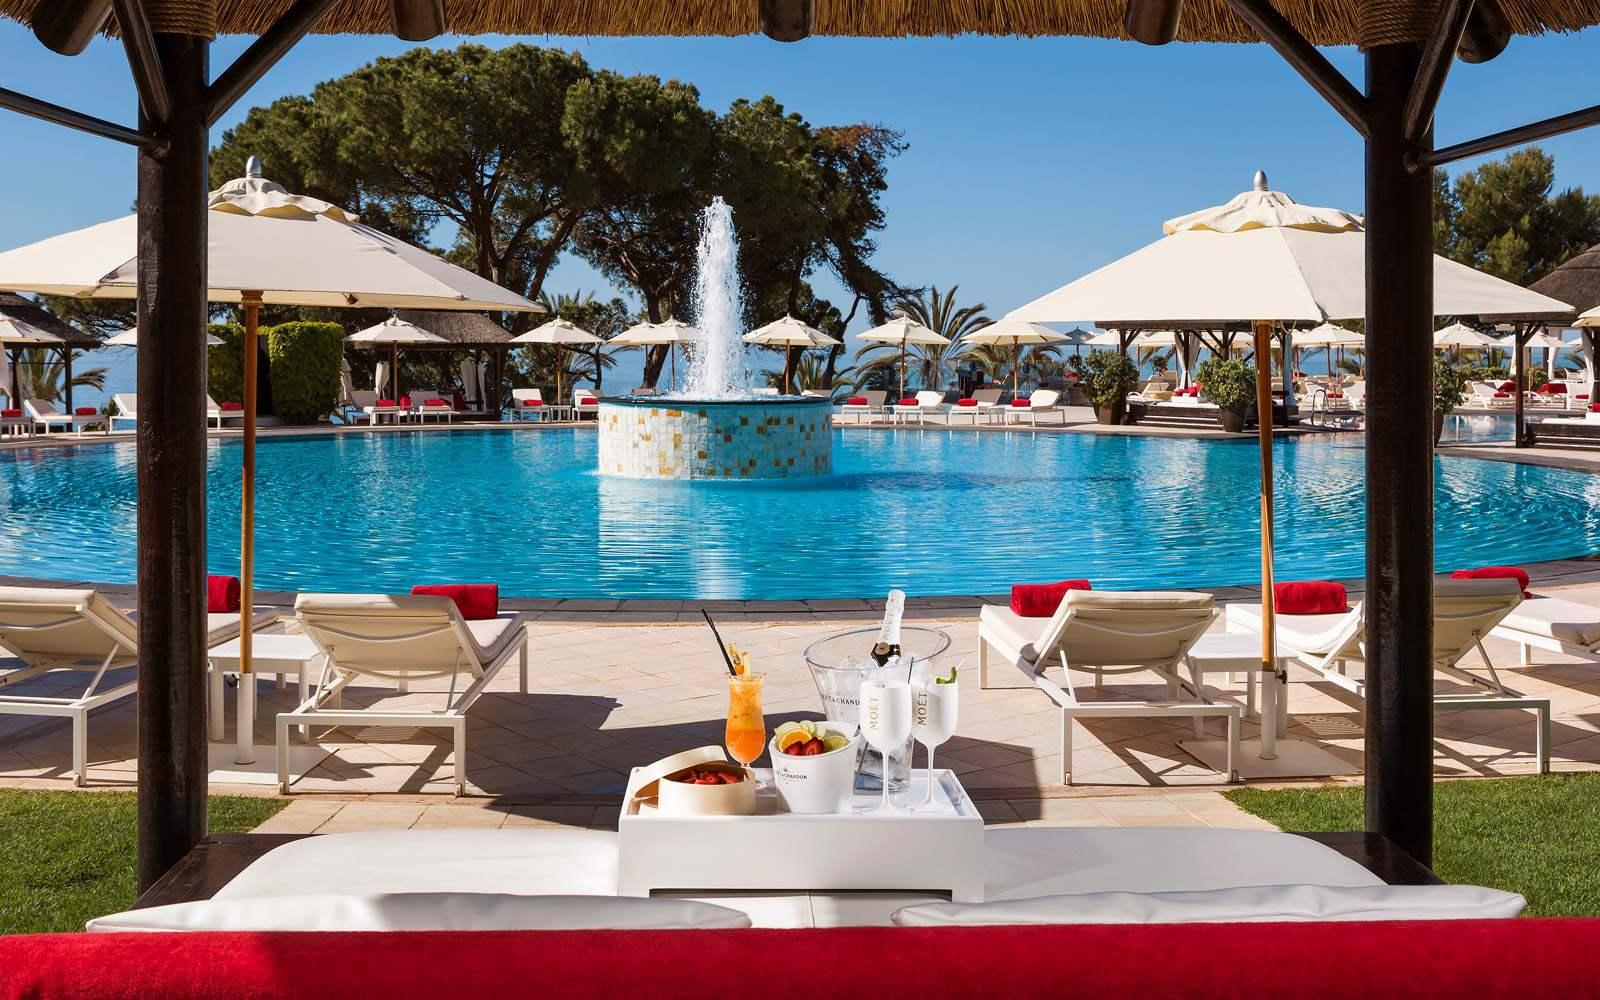 Hotel Gran Melia Don Pepe - Bali beds